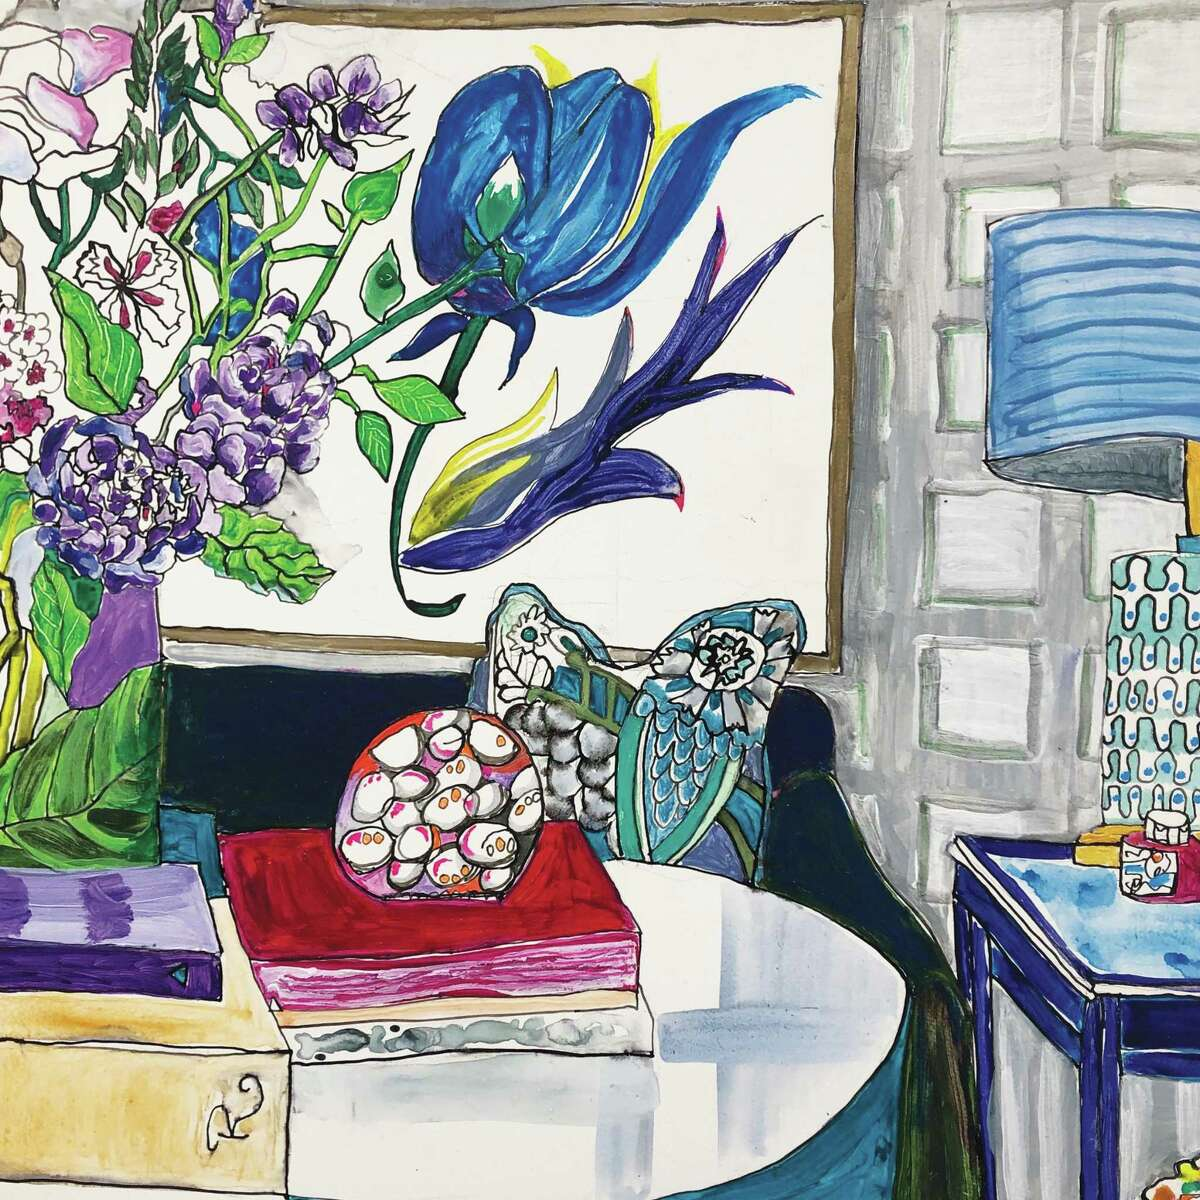 Firing Circuits artist Mari Gyorgyey draws on a family history shaped by war, love and loss.